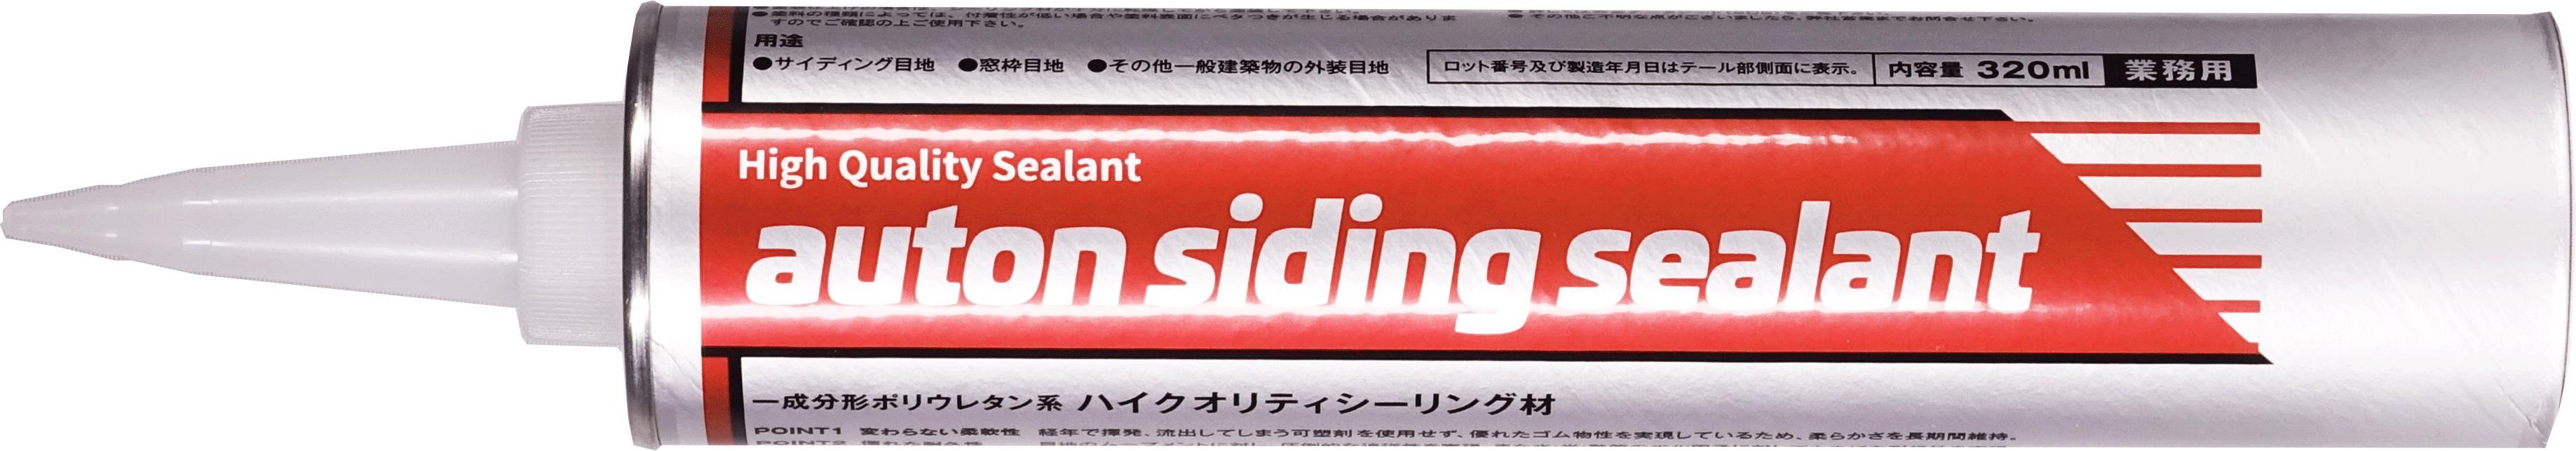 sidingcart_pic